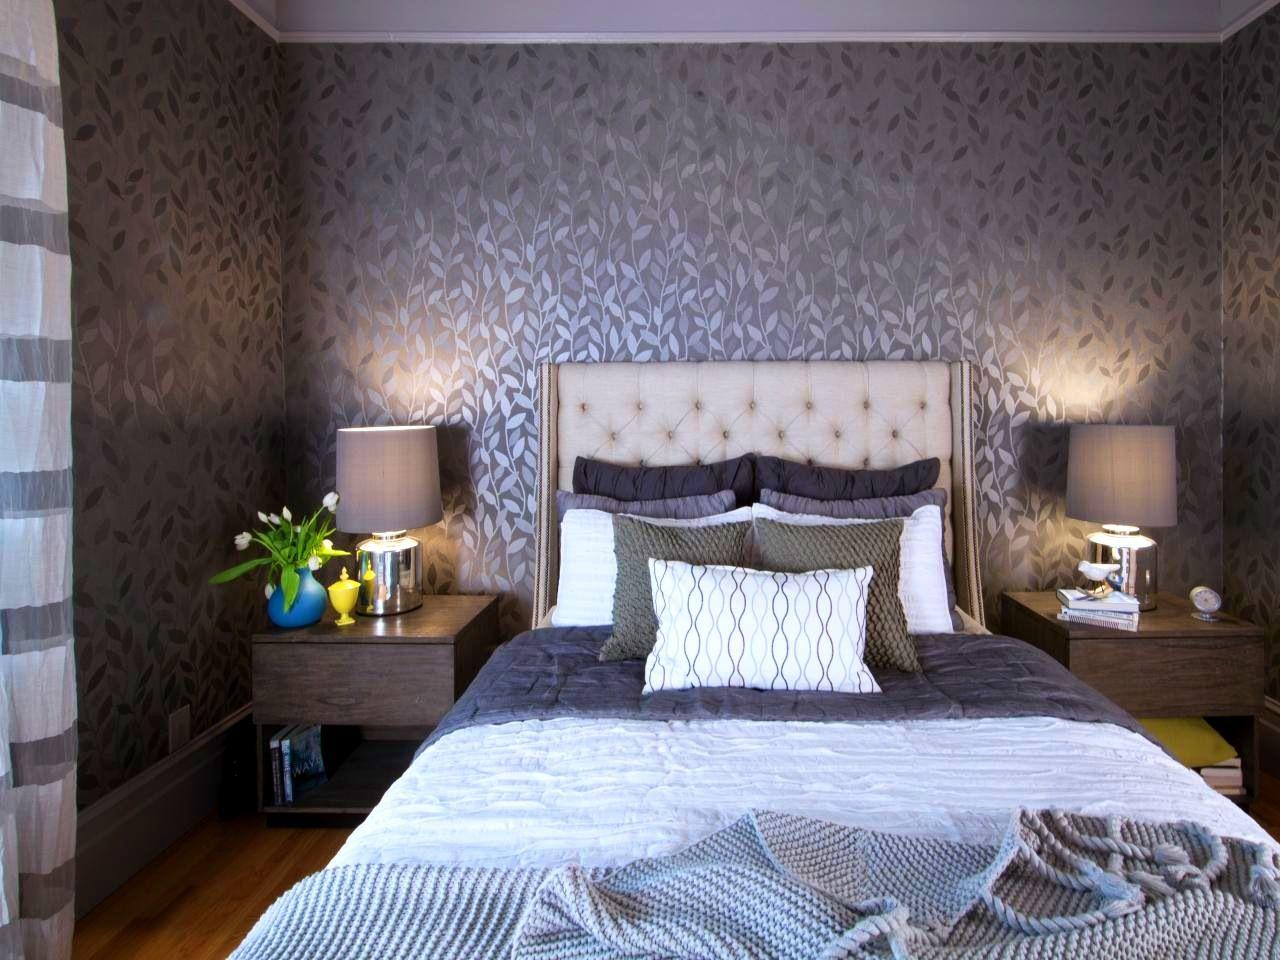 Bedroom Splendid Grey Gray Bedroom Ideas Light Dark Decorating With Yellow Master Teal And War Master Bedroom Design Small Master Bedroom Cozy Master Bedroom